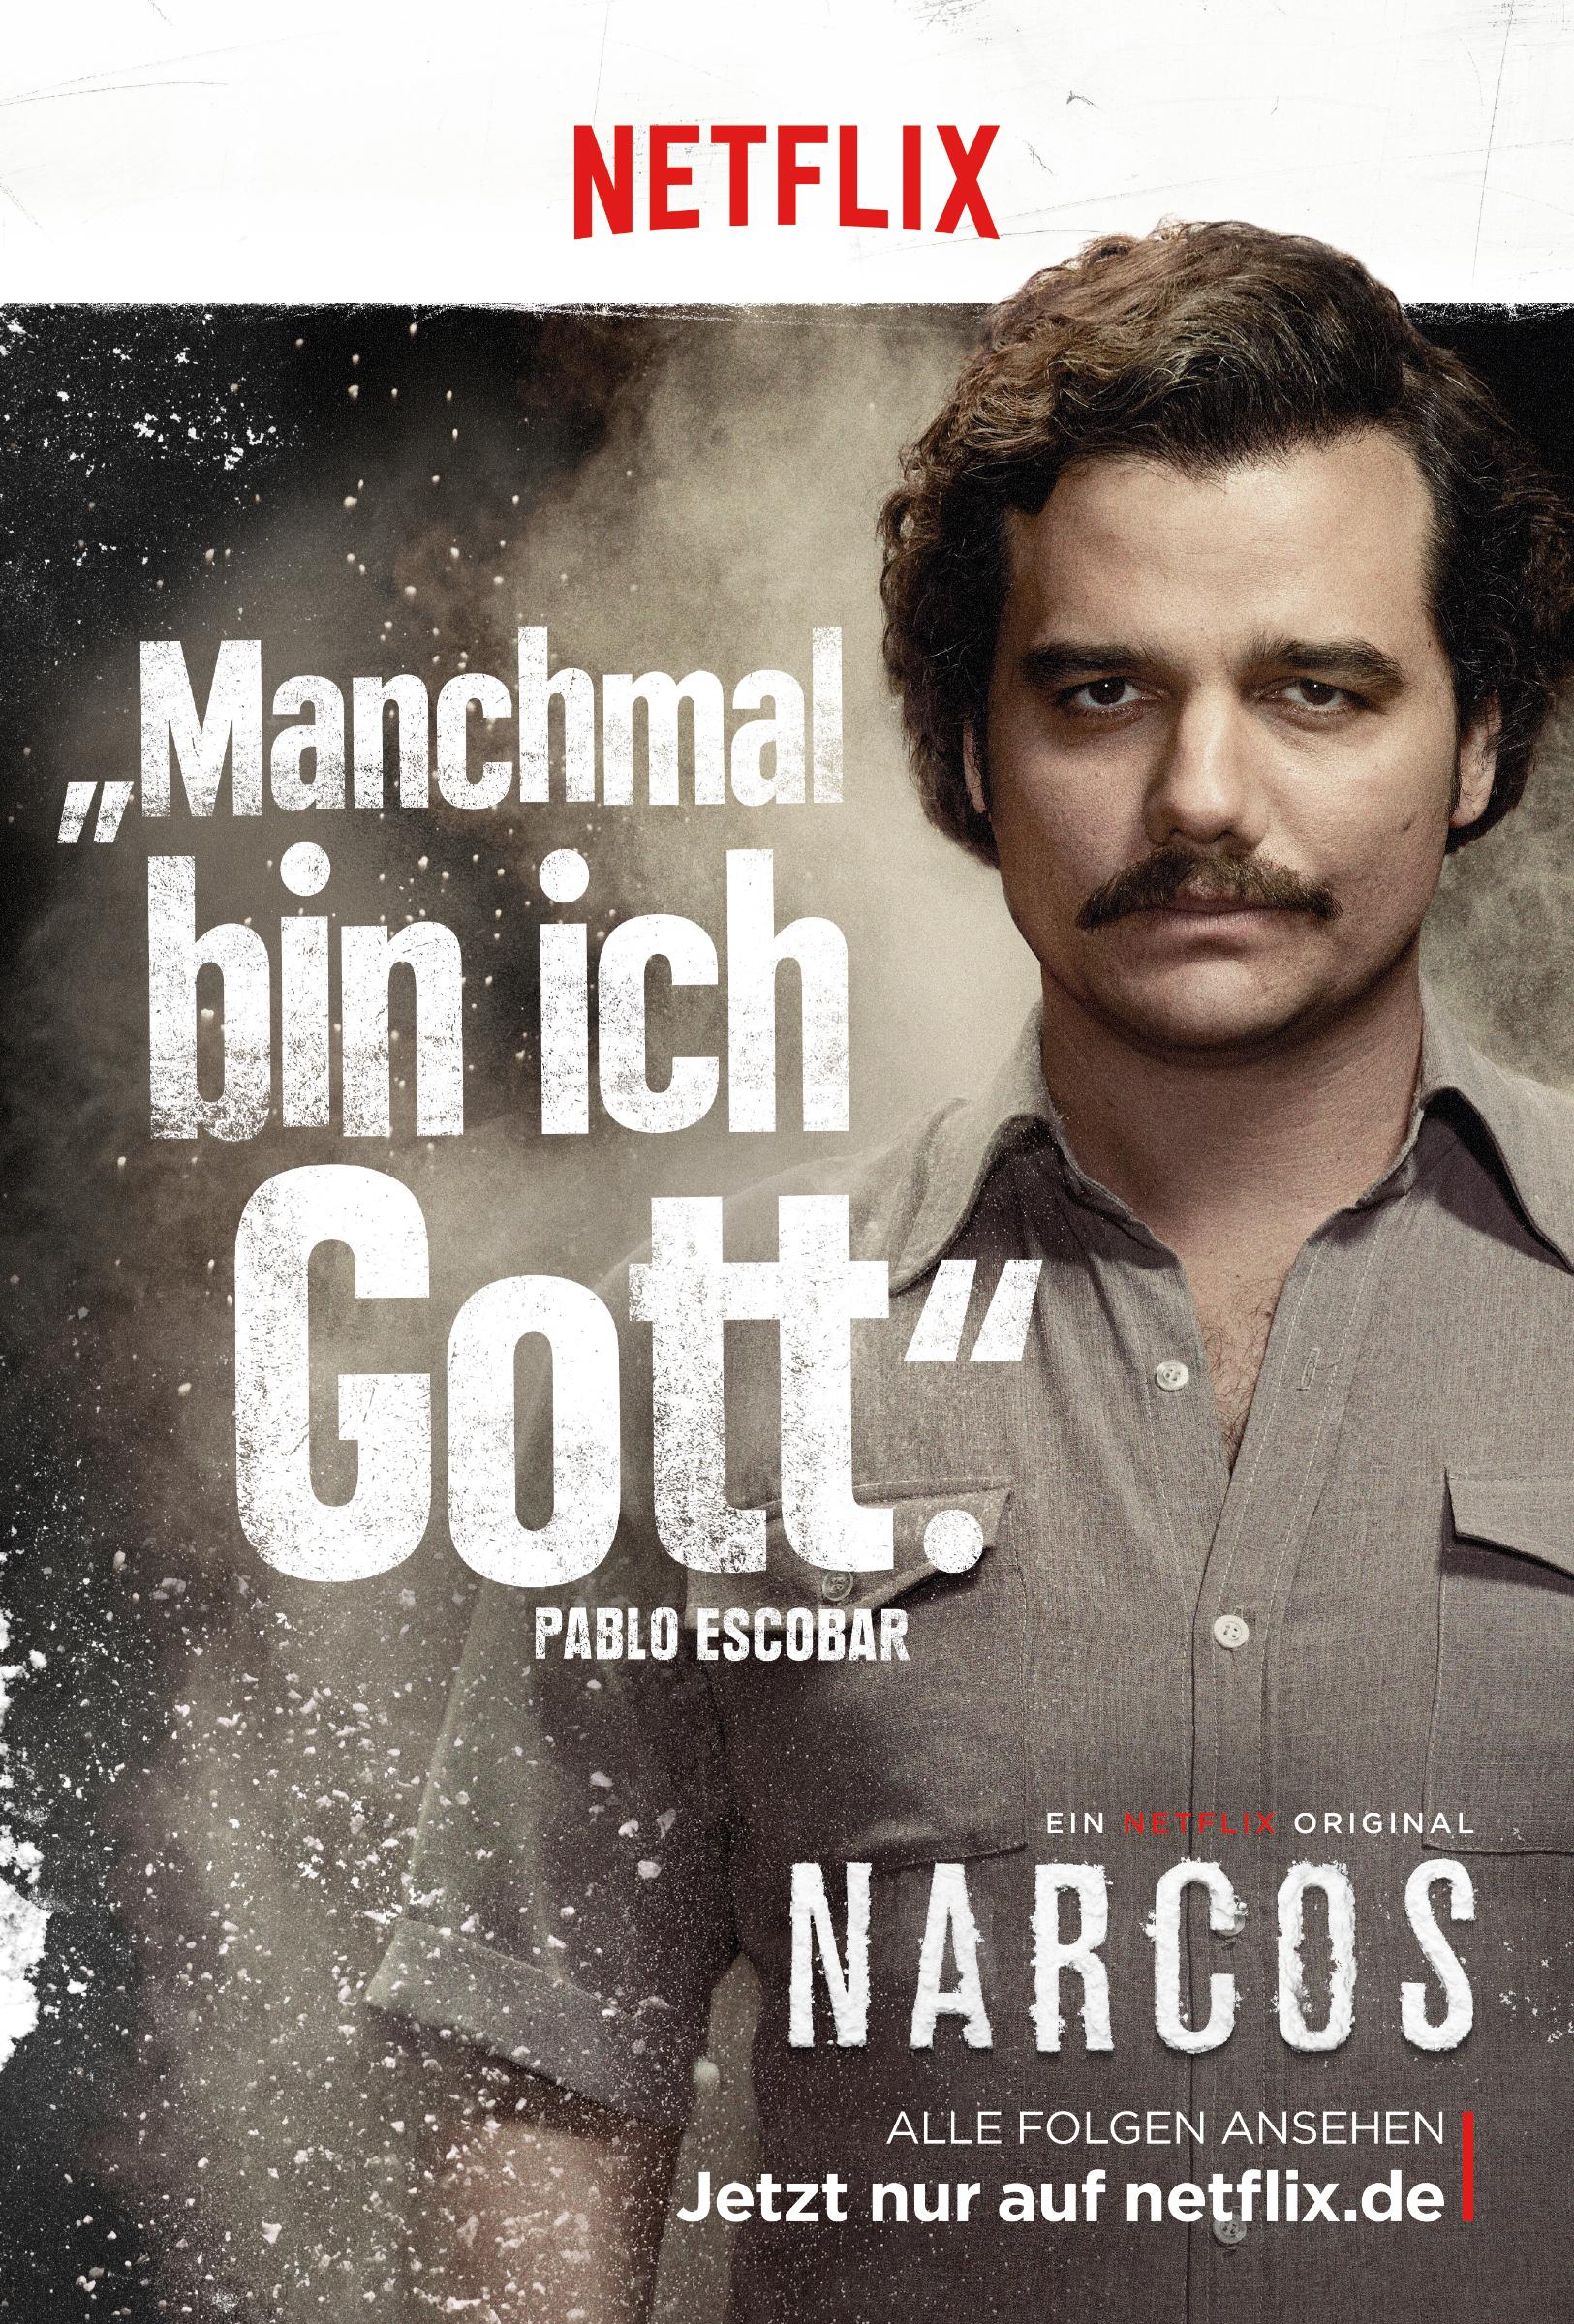 strobel_martin_netflix_narcos_01